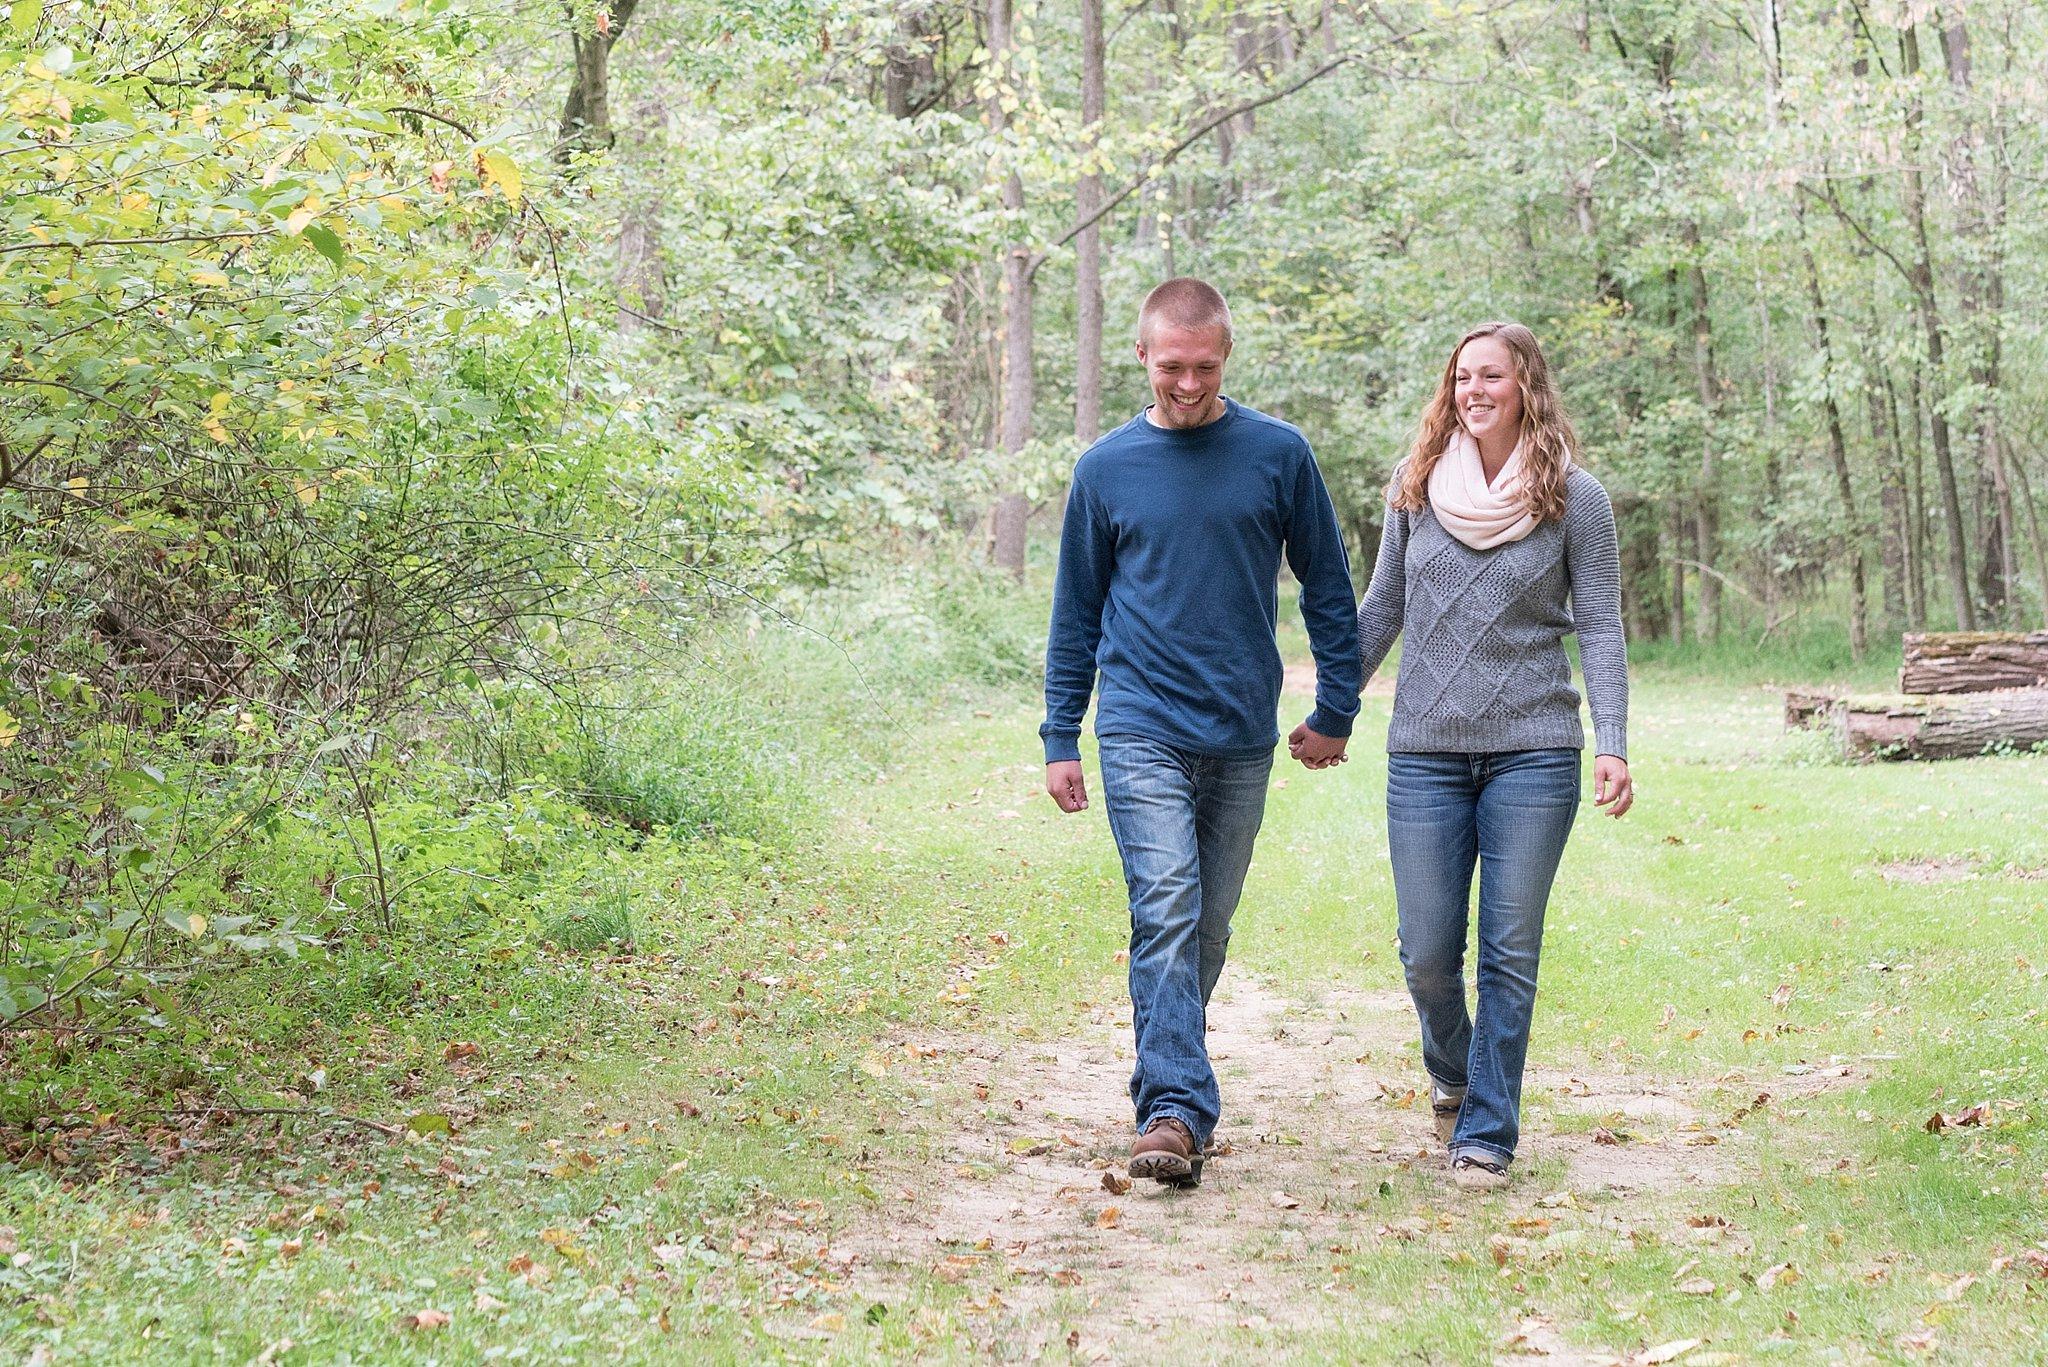 Shallowbrook farm Lancaster pa wedding and engagement photographer photography photo